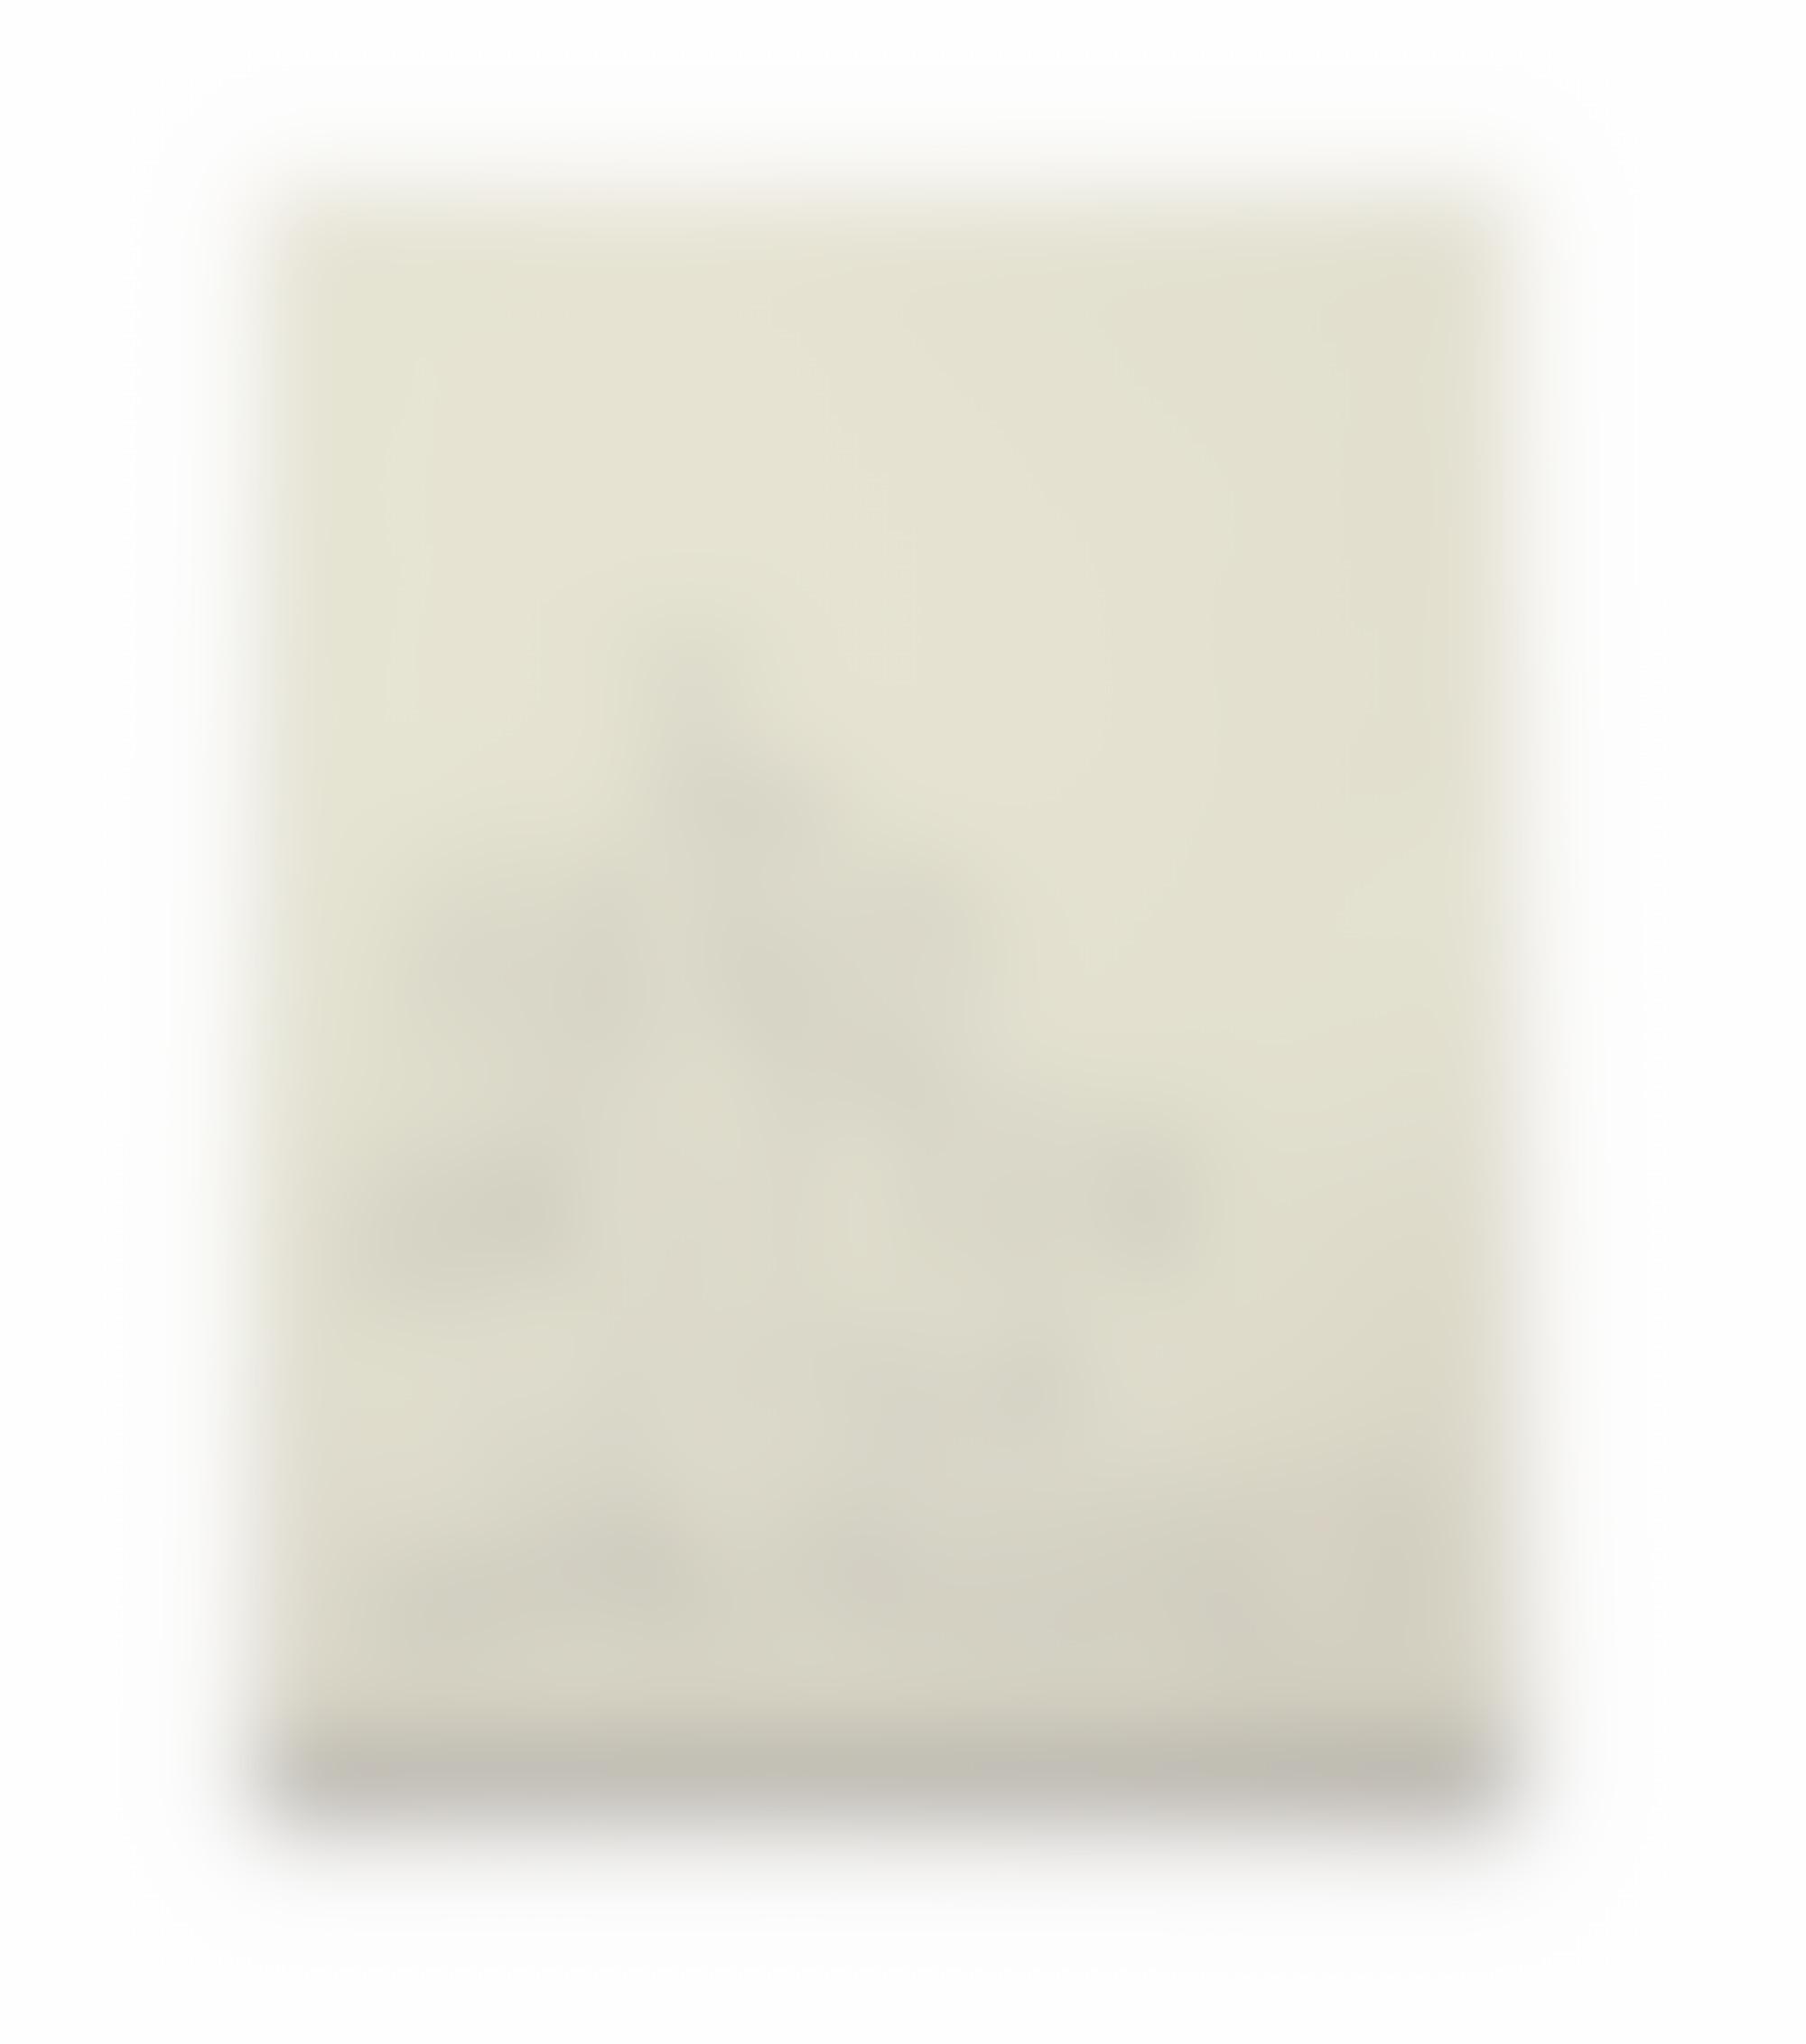 HWLP Book Cover autocompressfitresizeixlibphp 1 1 0max h2000max w3 D2000q80s473bca5f166cbb4b34da922e0483739d